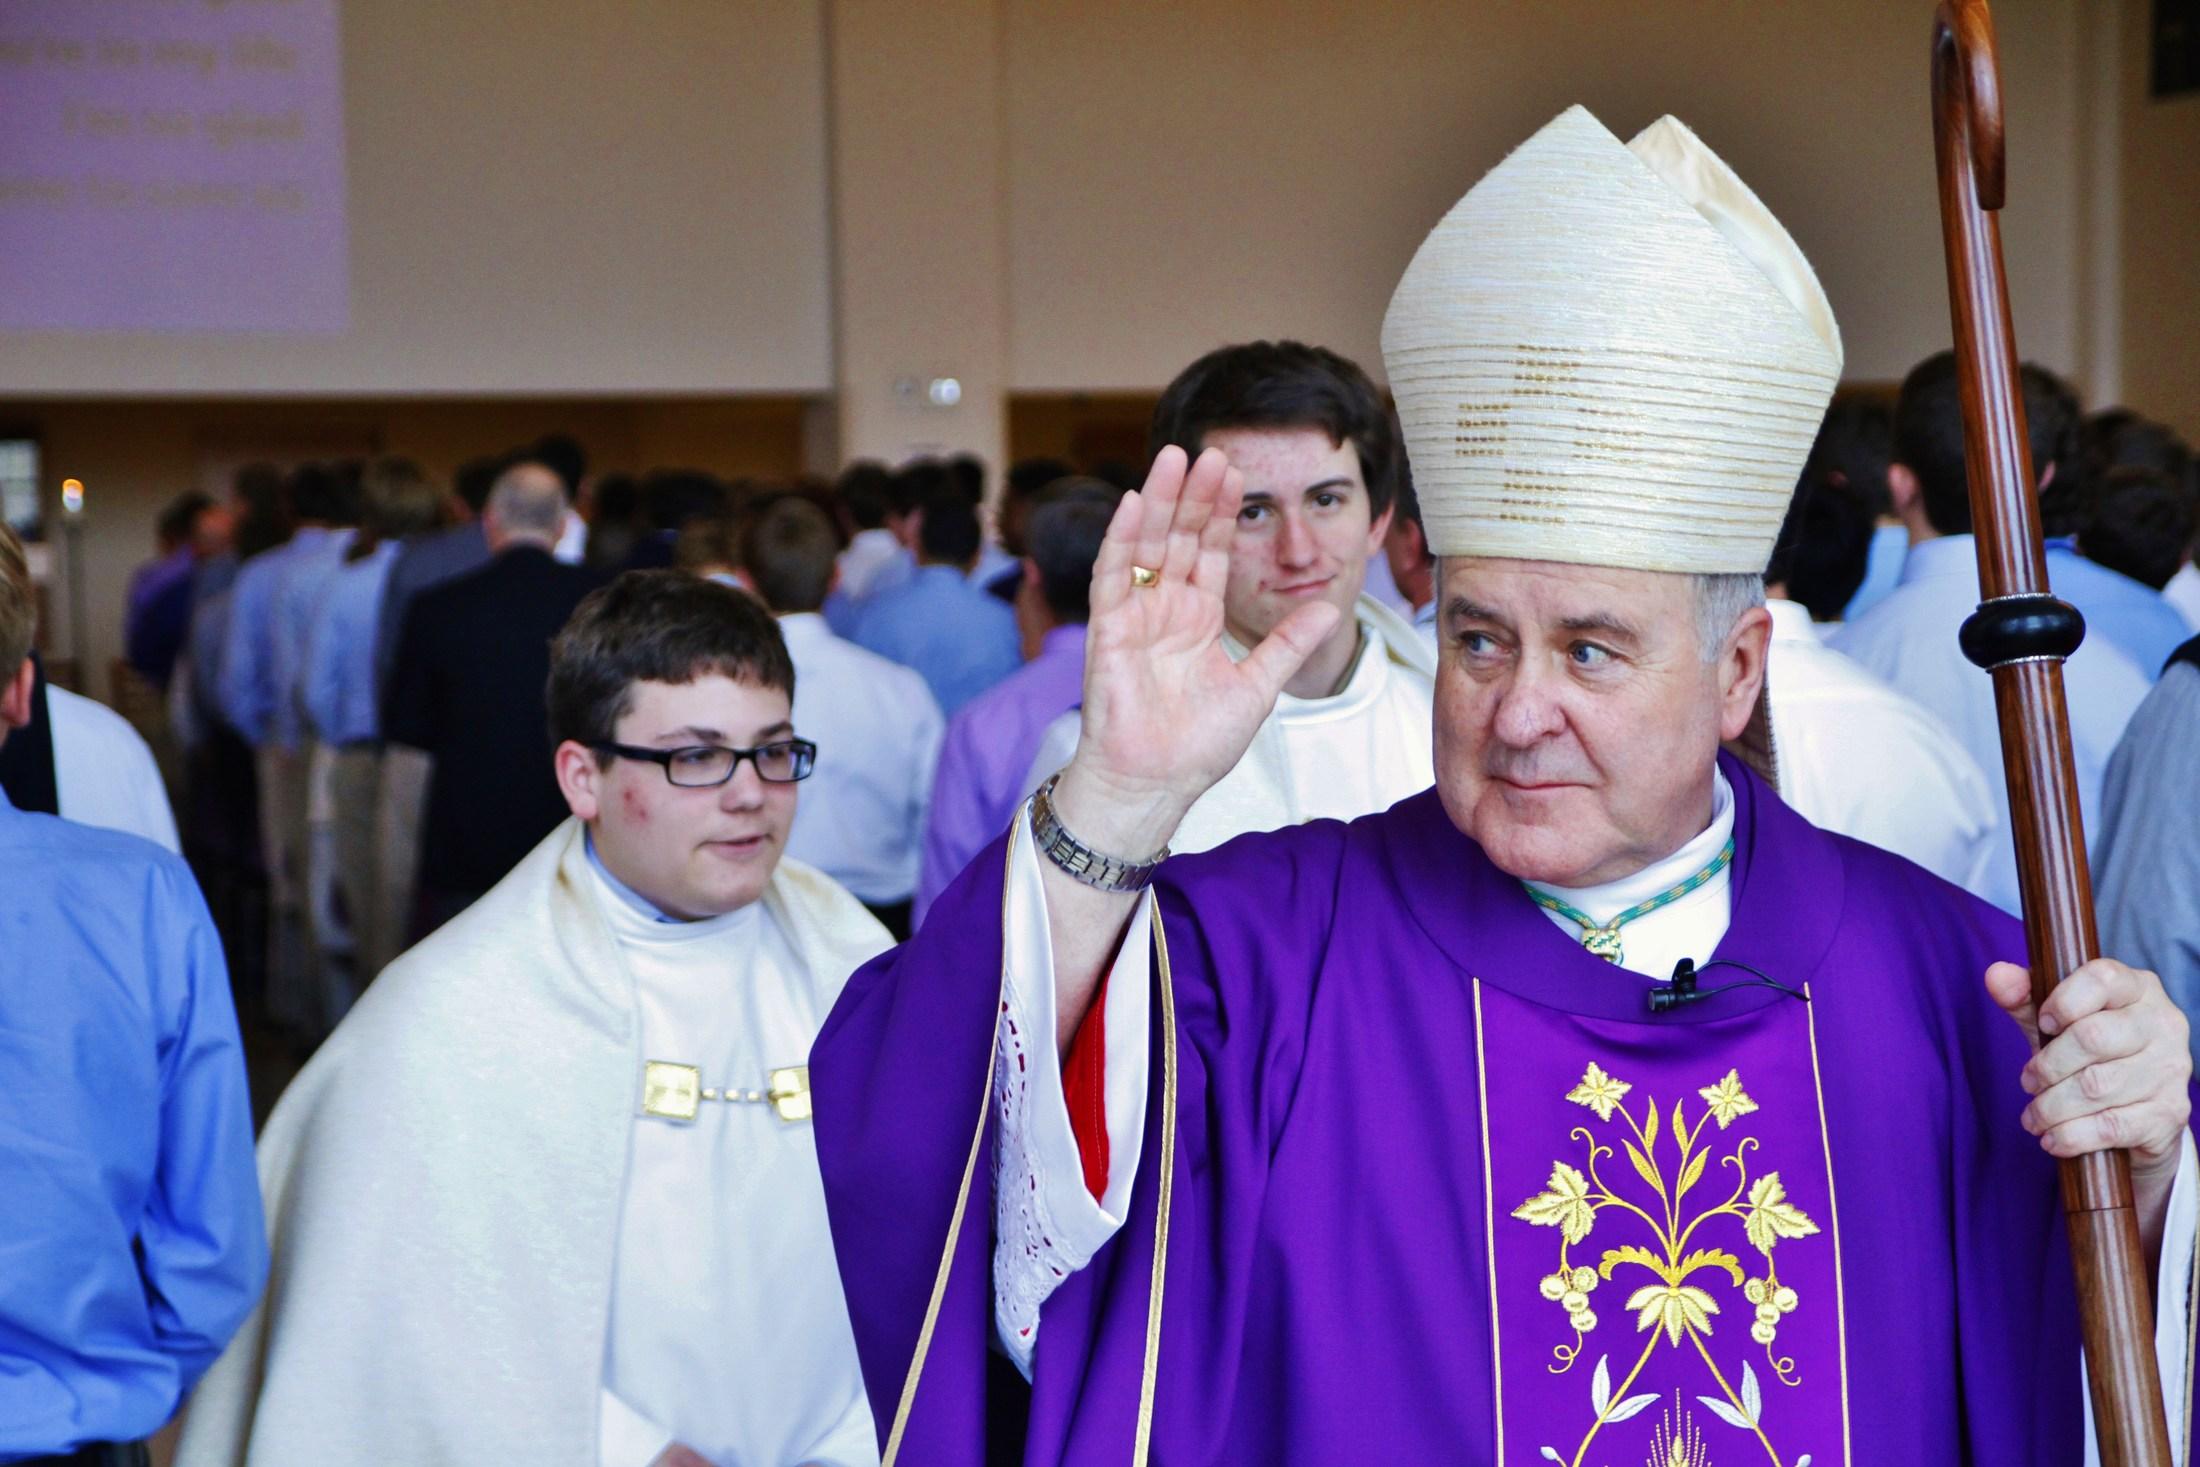 Archbishop Robert Carlson